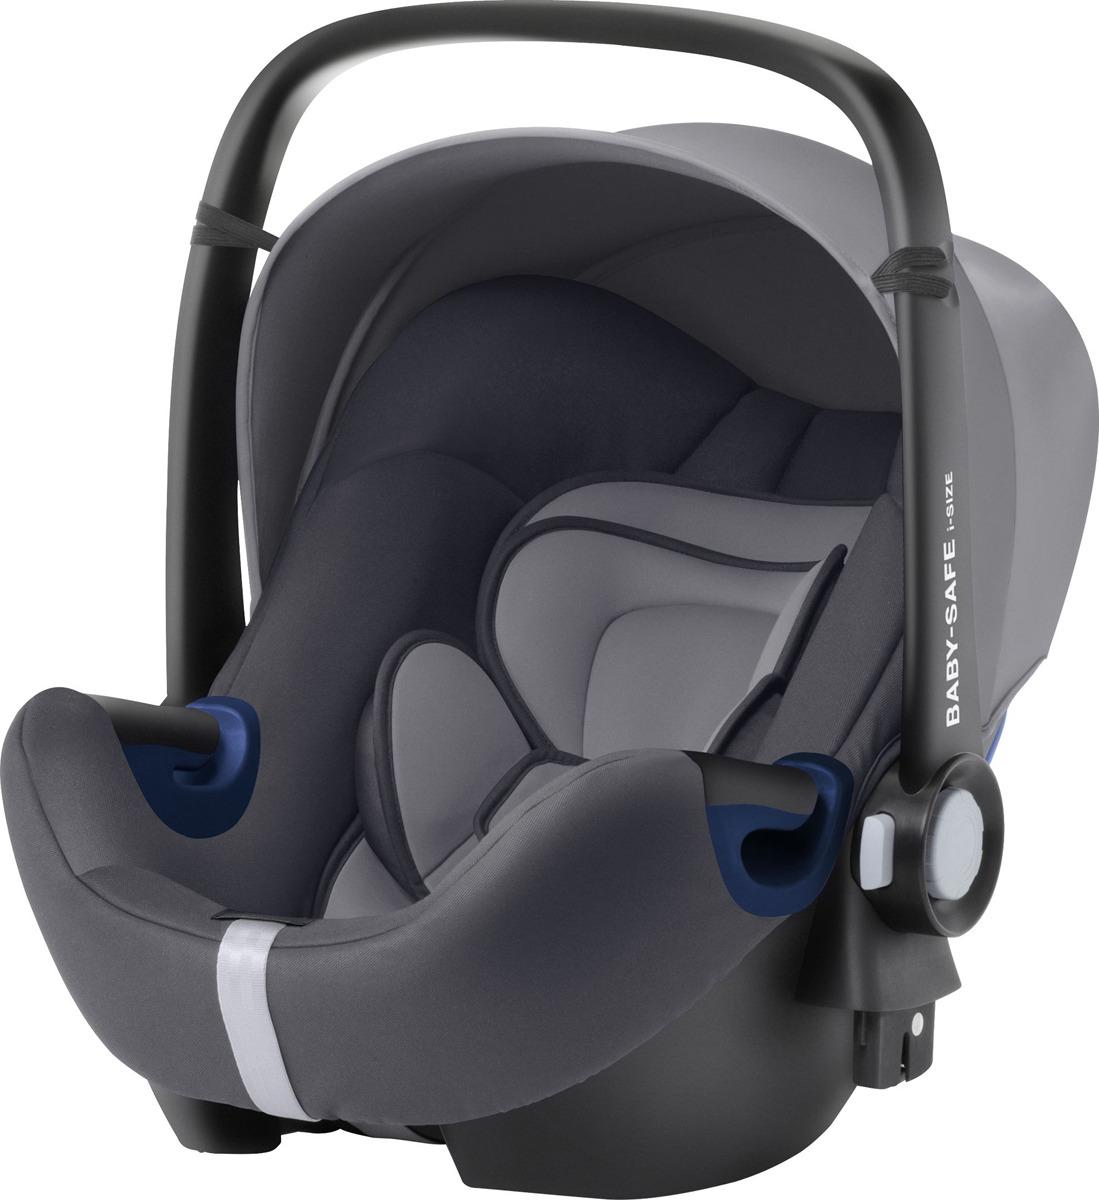 Автокресло детское Britax Roemer Baby-Safe2 i-size Storm Grey Trendline, до 13 кг детское автокресло baby safe2 i size coral peach trendline